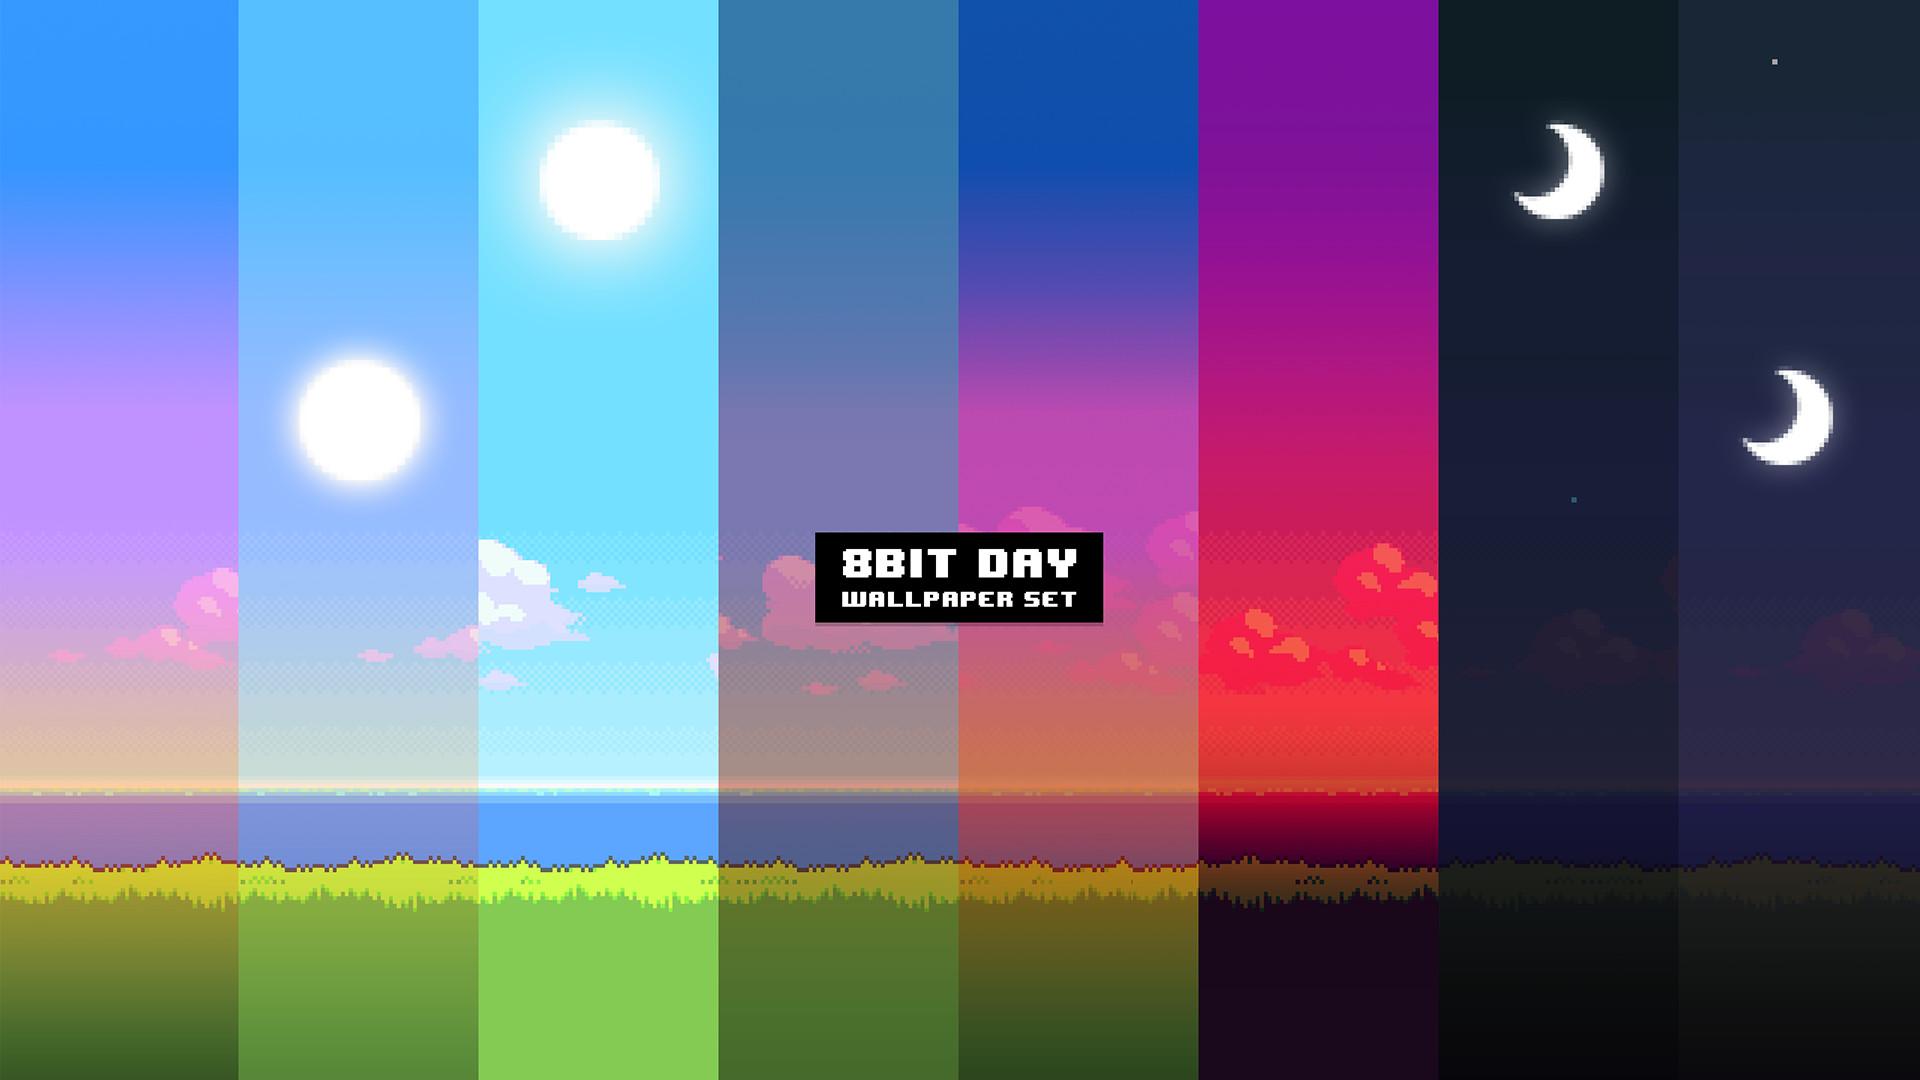 UPDATE: New version of the '8Bit Day' Wallpaper Set. Pixel wallpaper changes